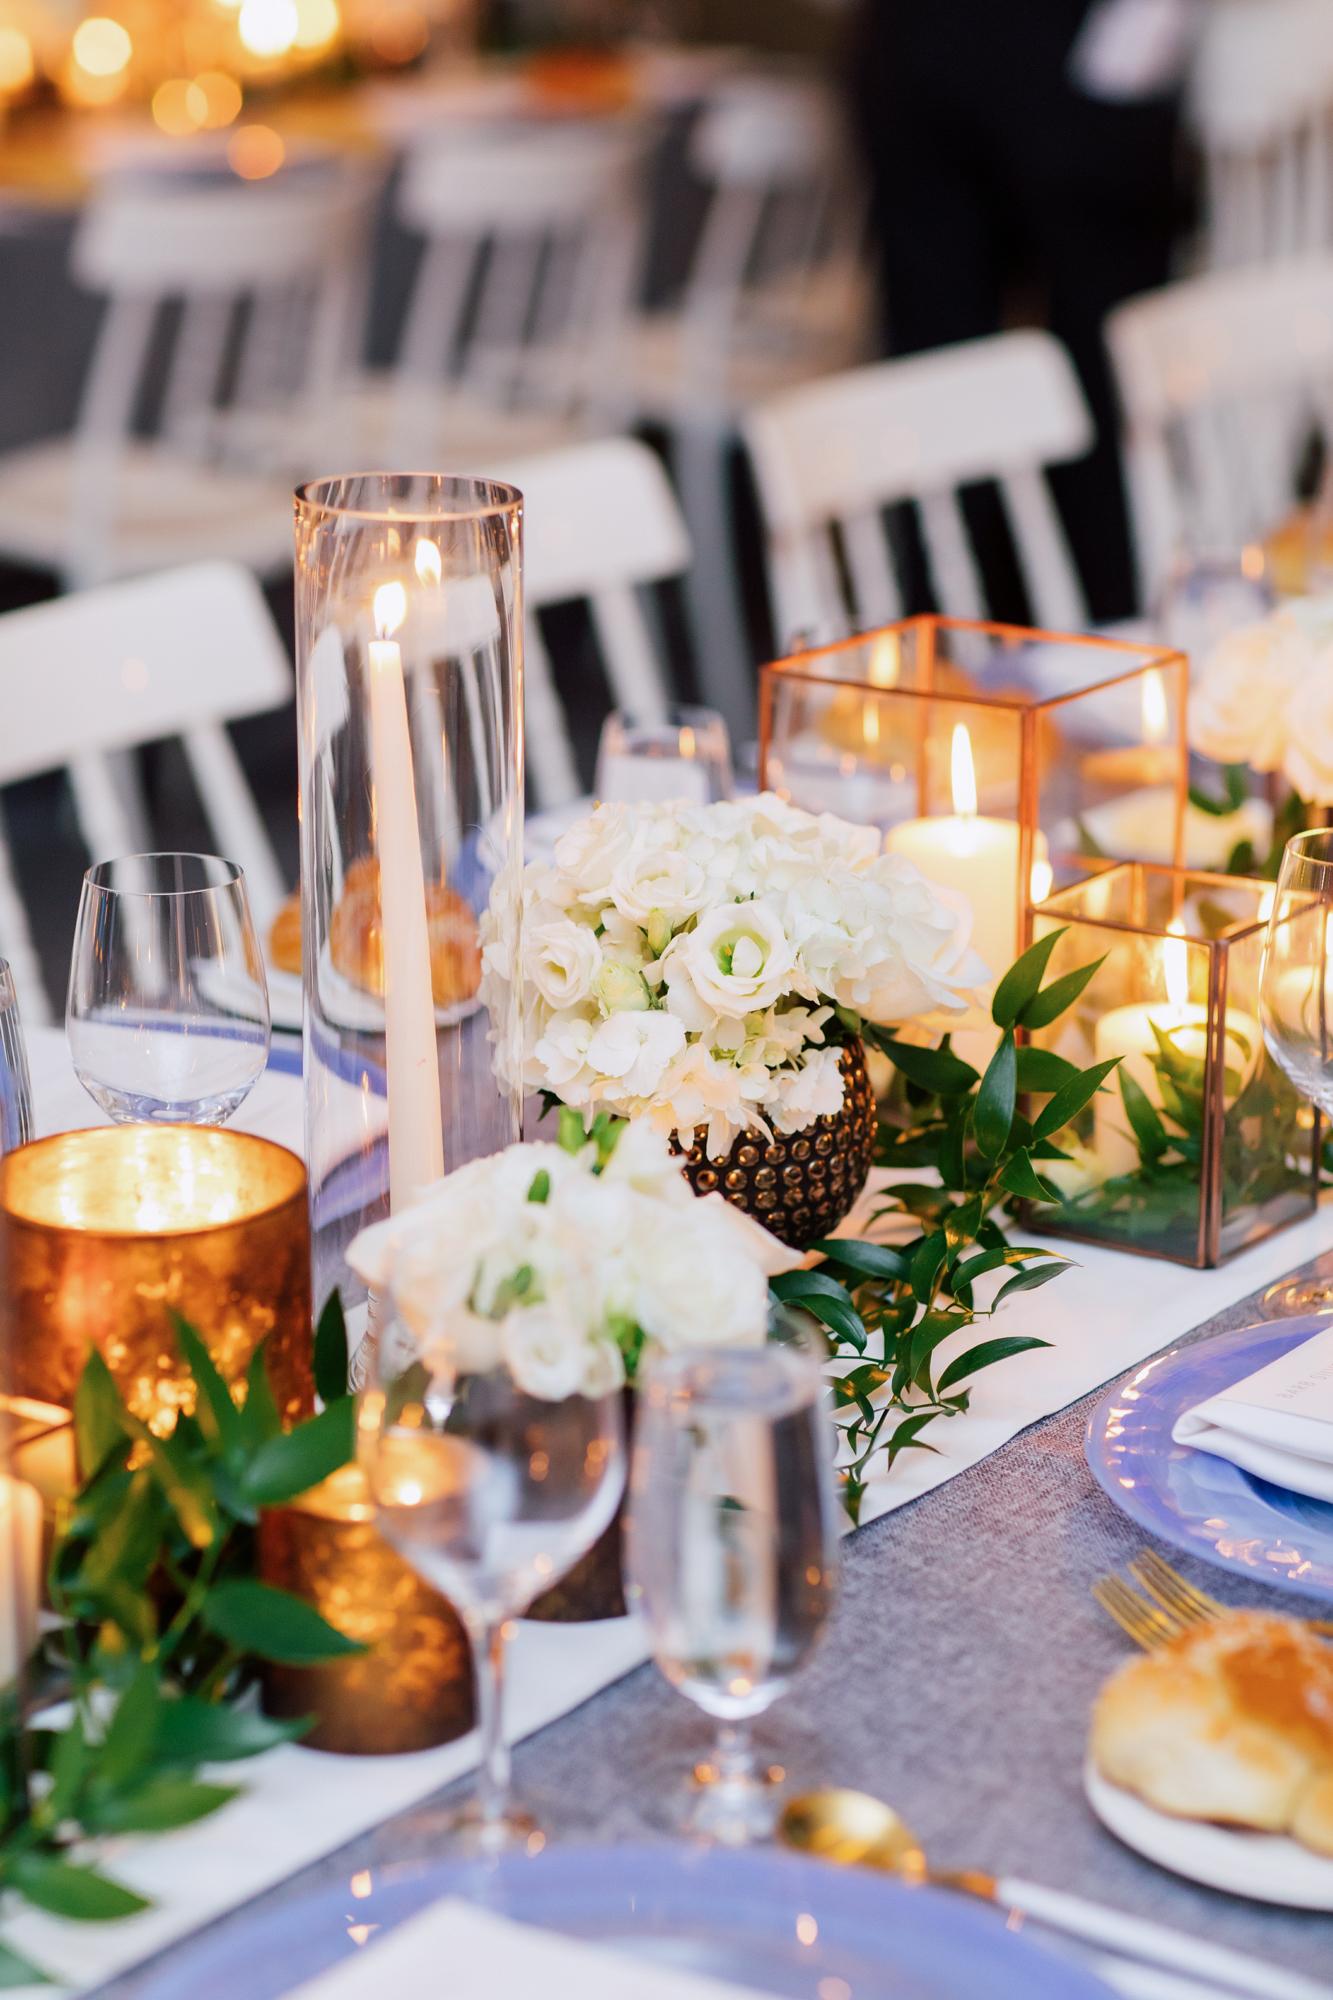 jackie o wedding arrangments